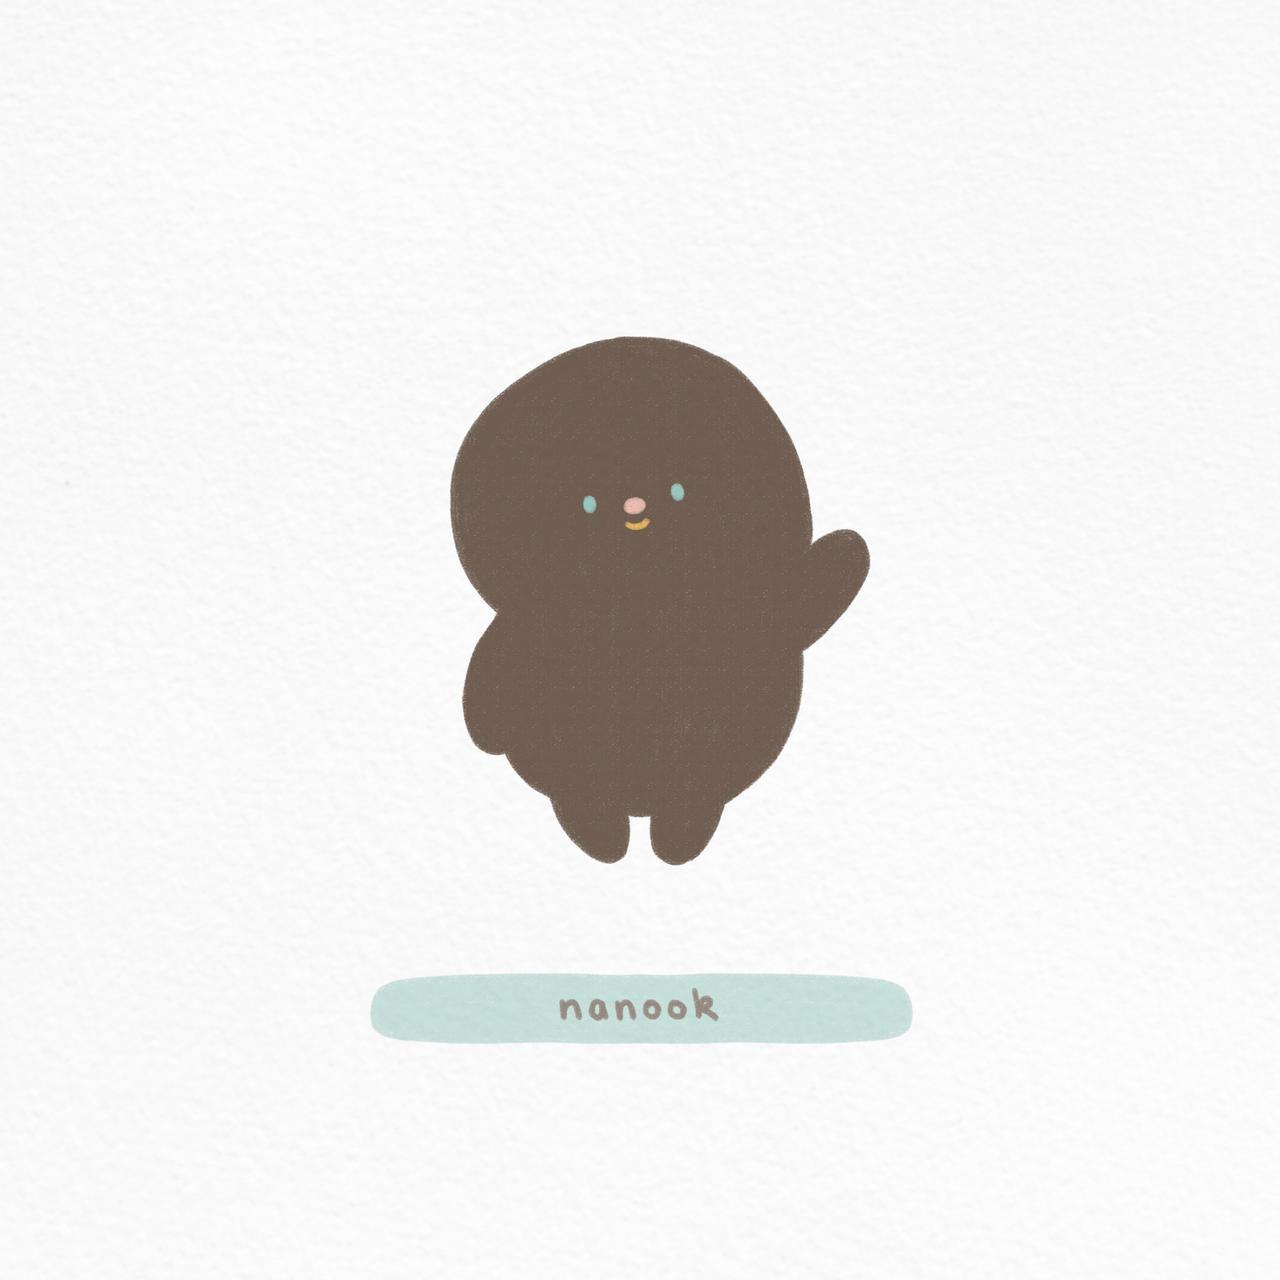 Nanook